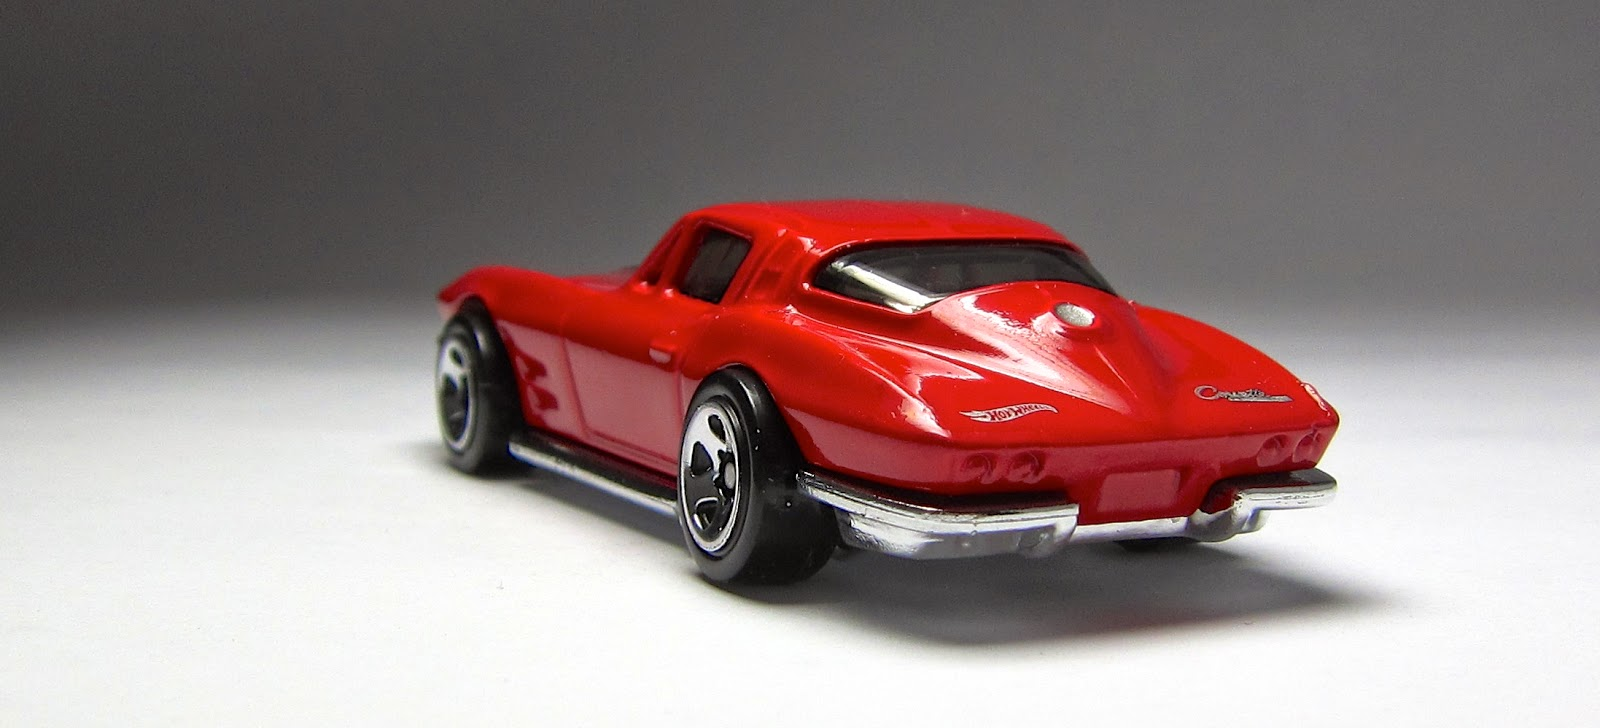 Hot Wheels 64 Corvette Stingray